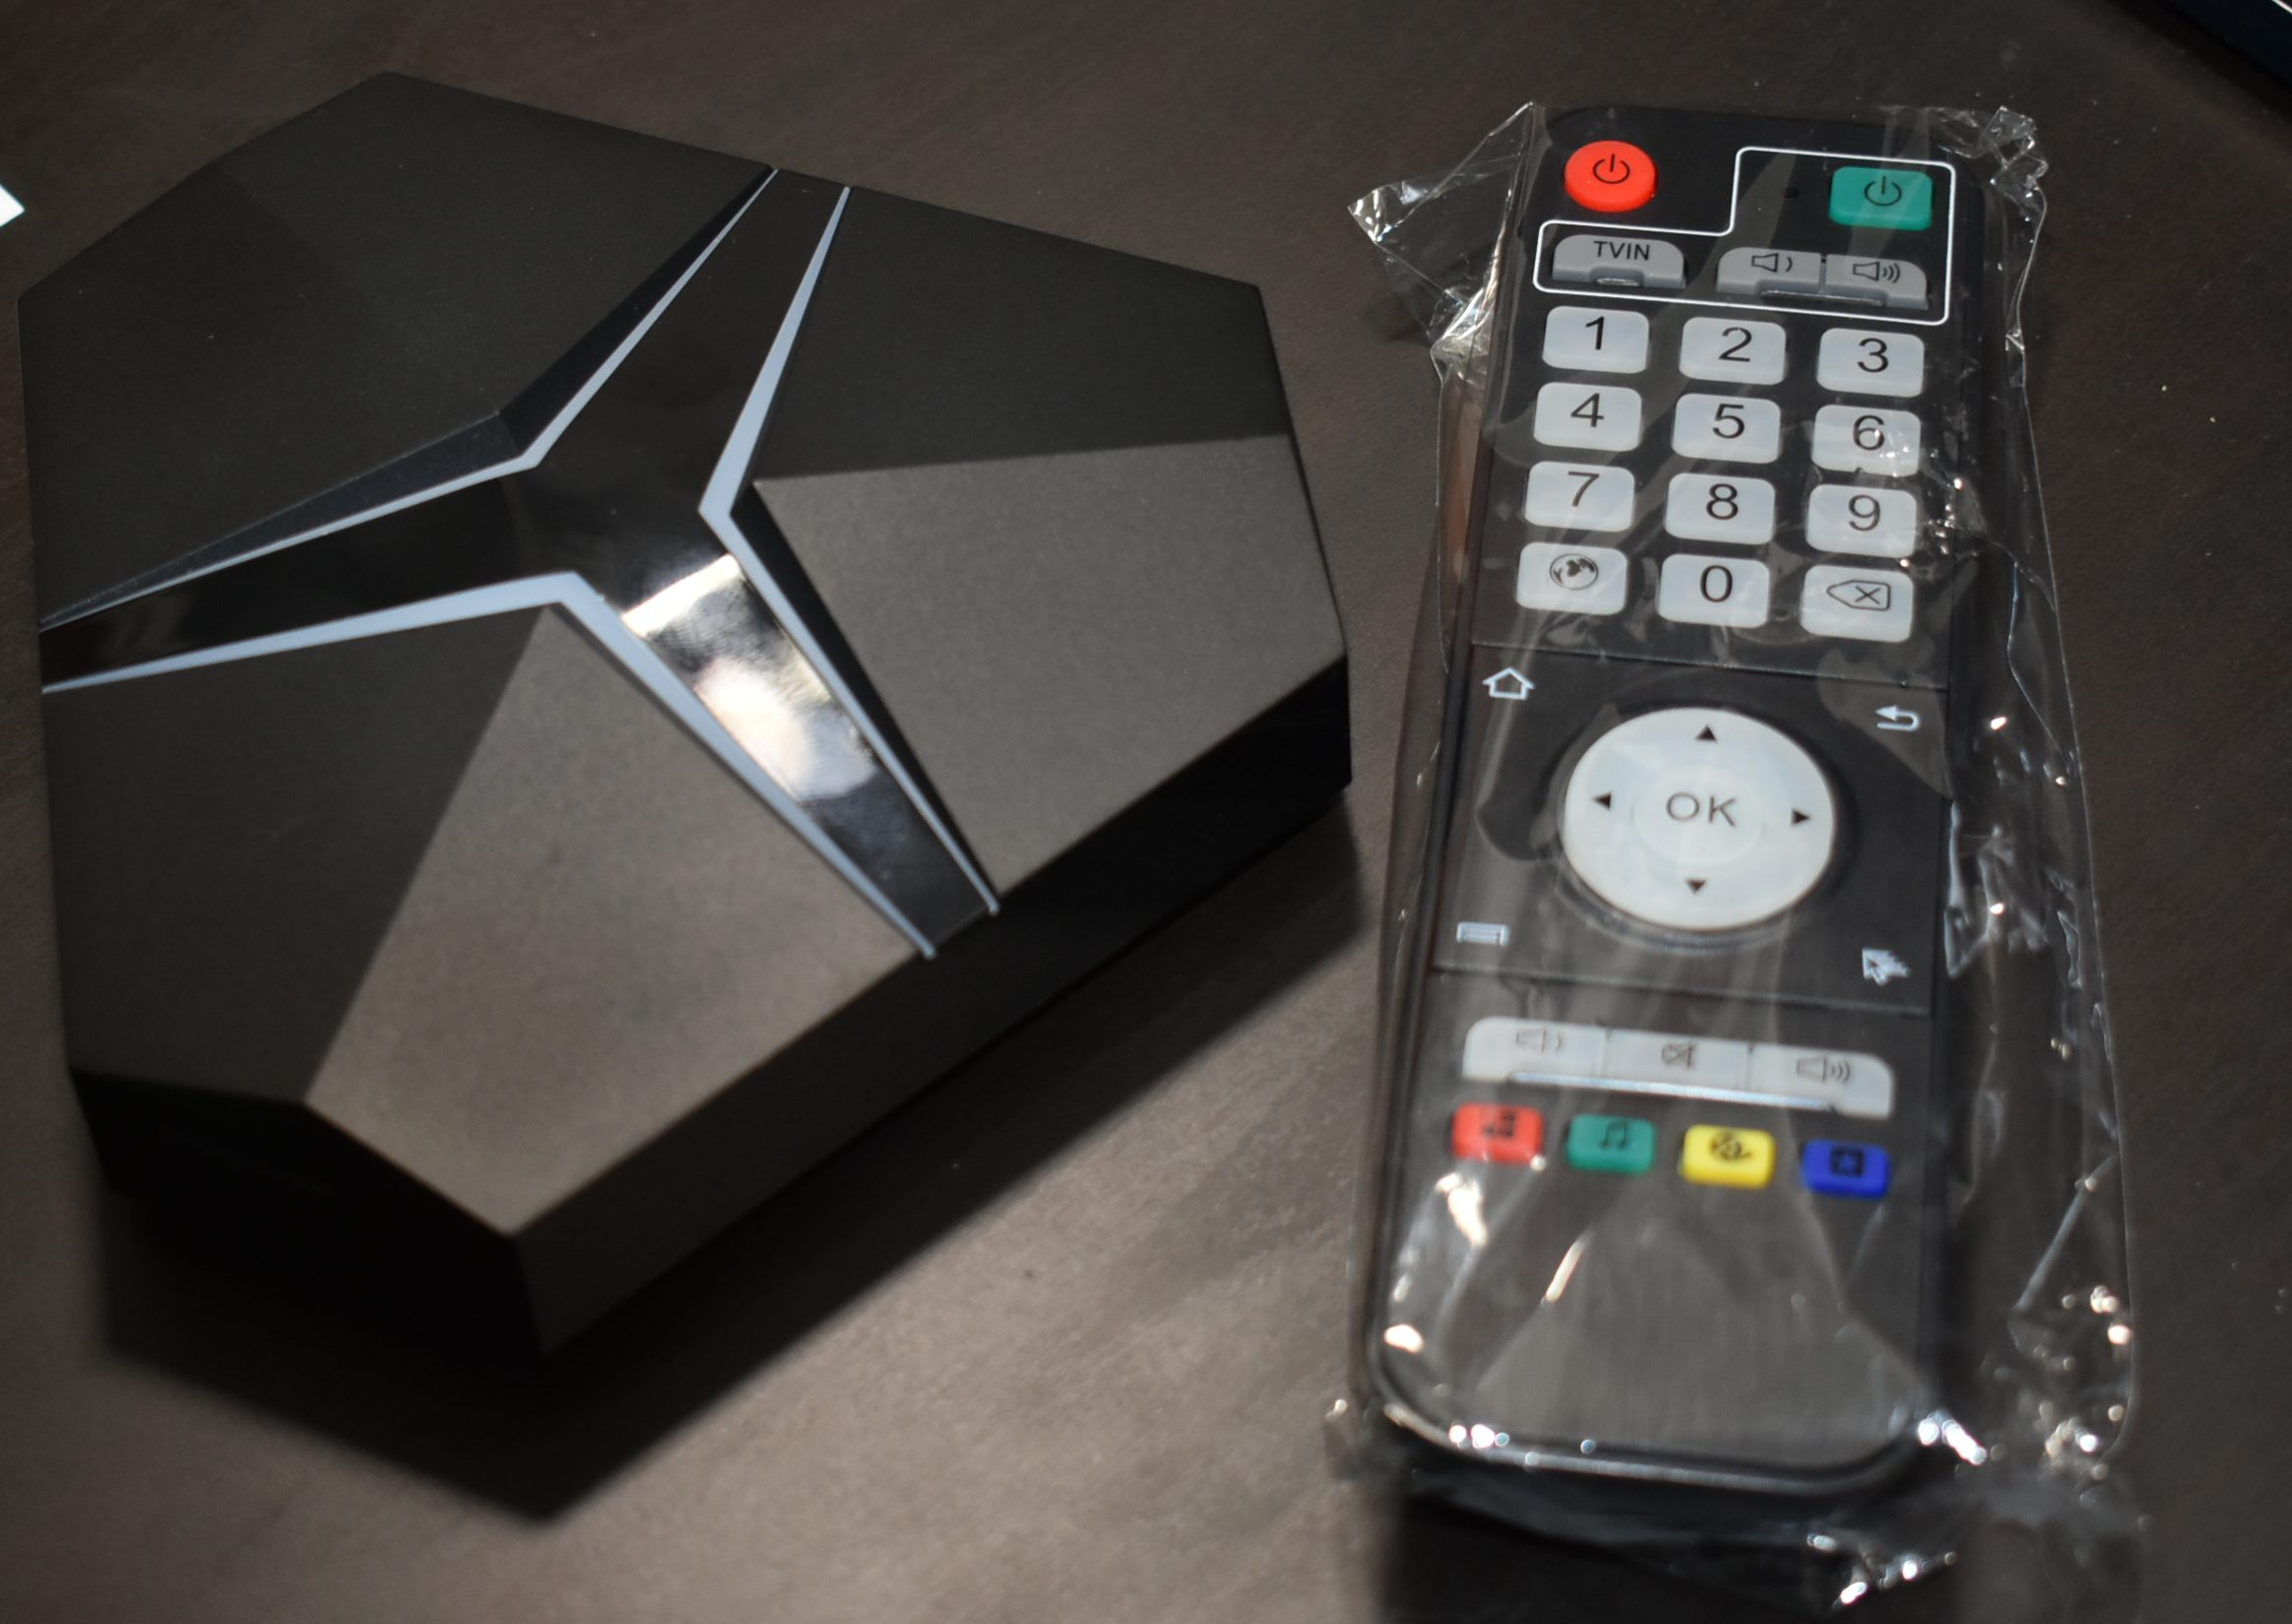 Magicsee Iron+ TV Box 3GB Ram 32 GB Rom Kodi Android Box - S912